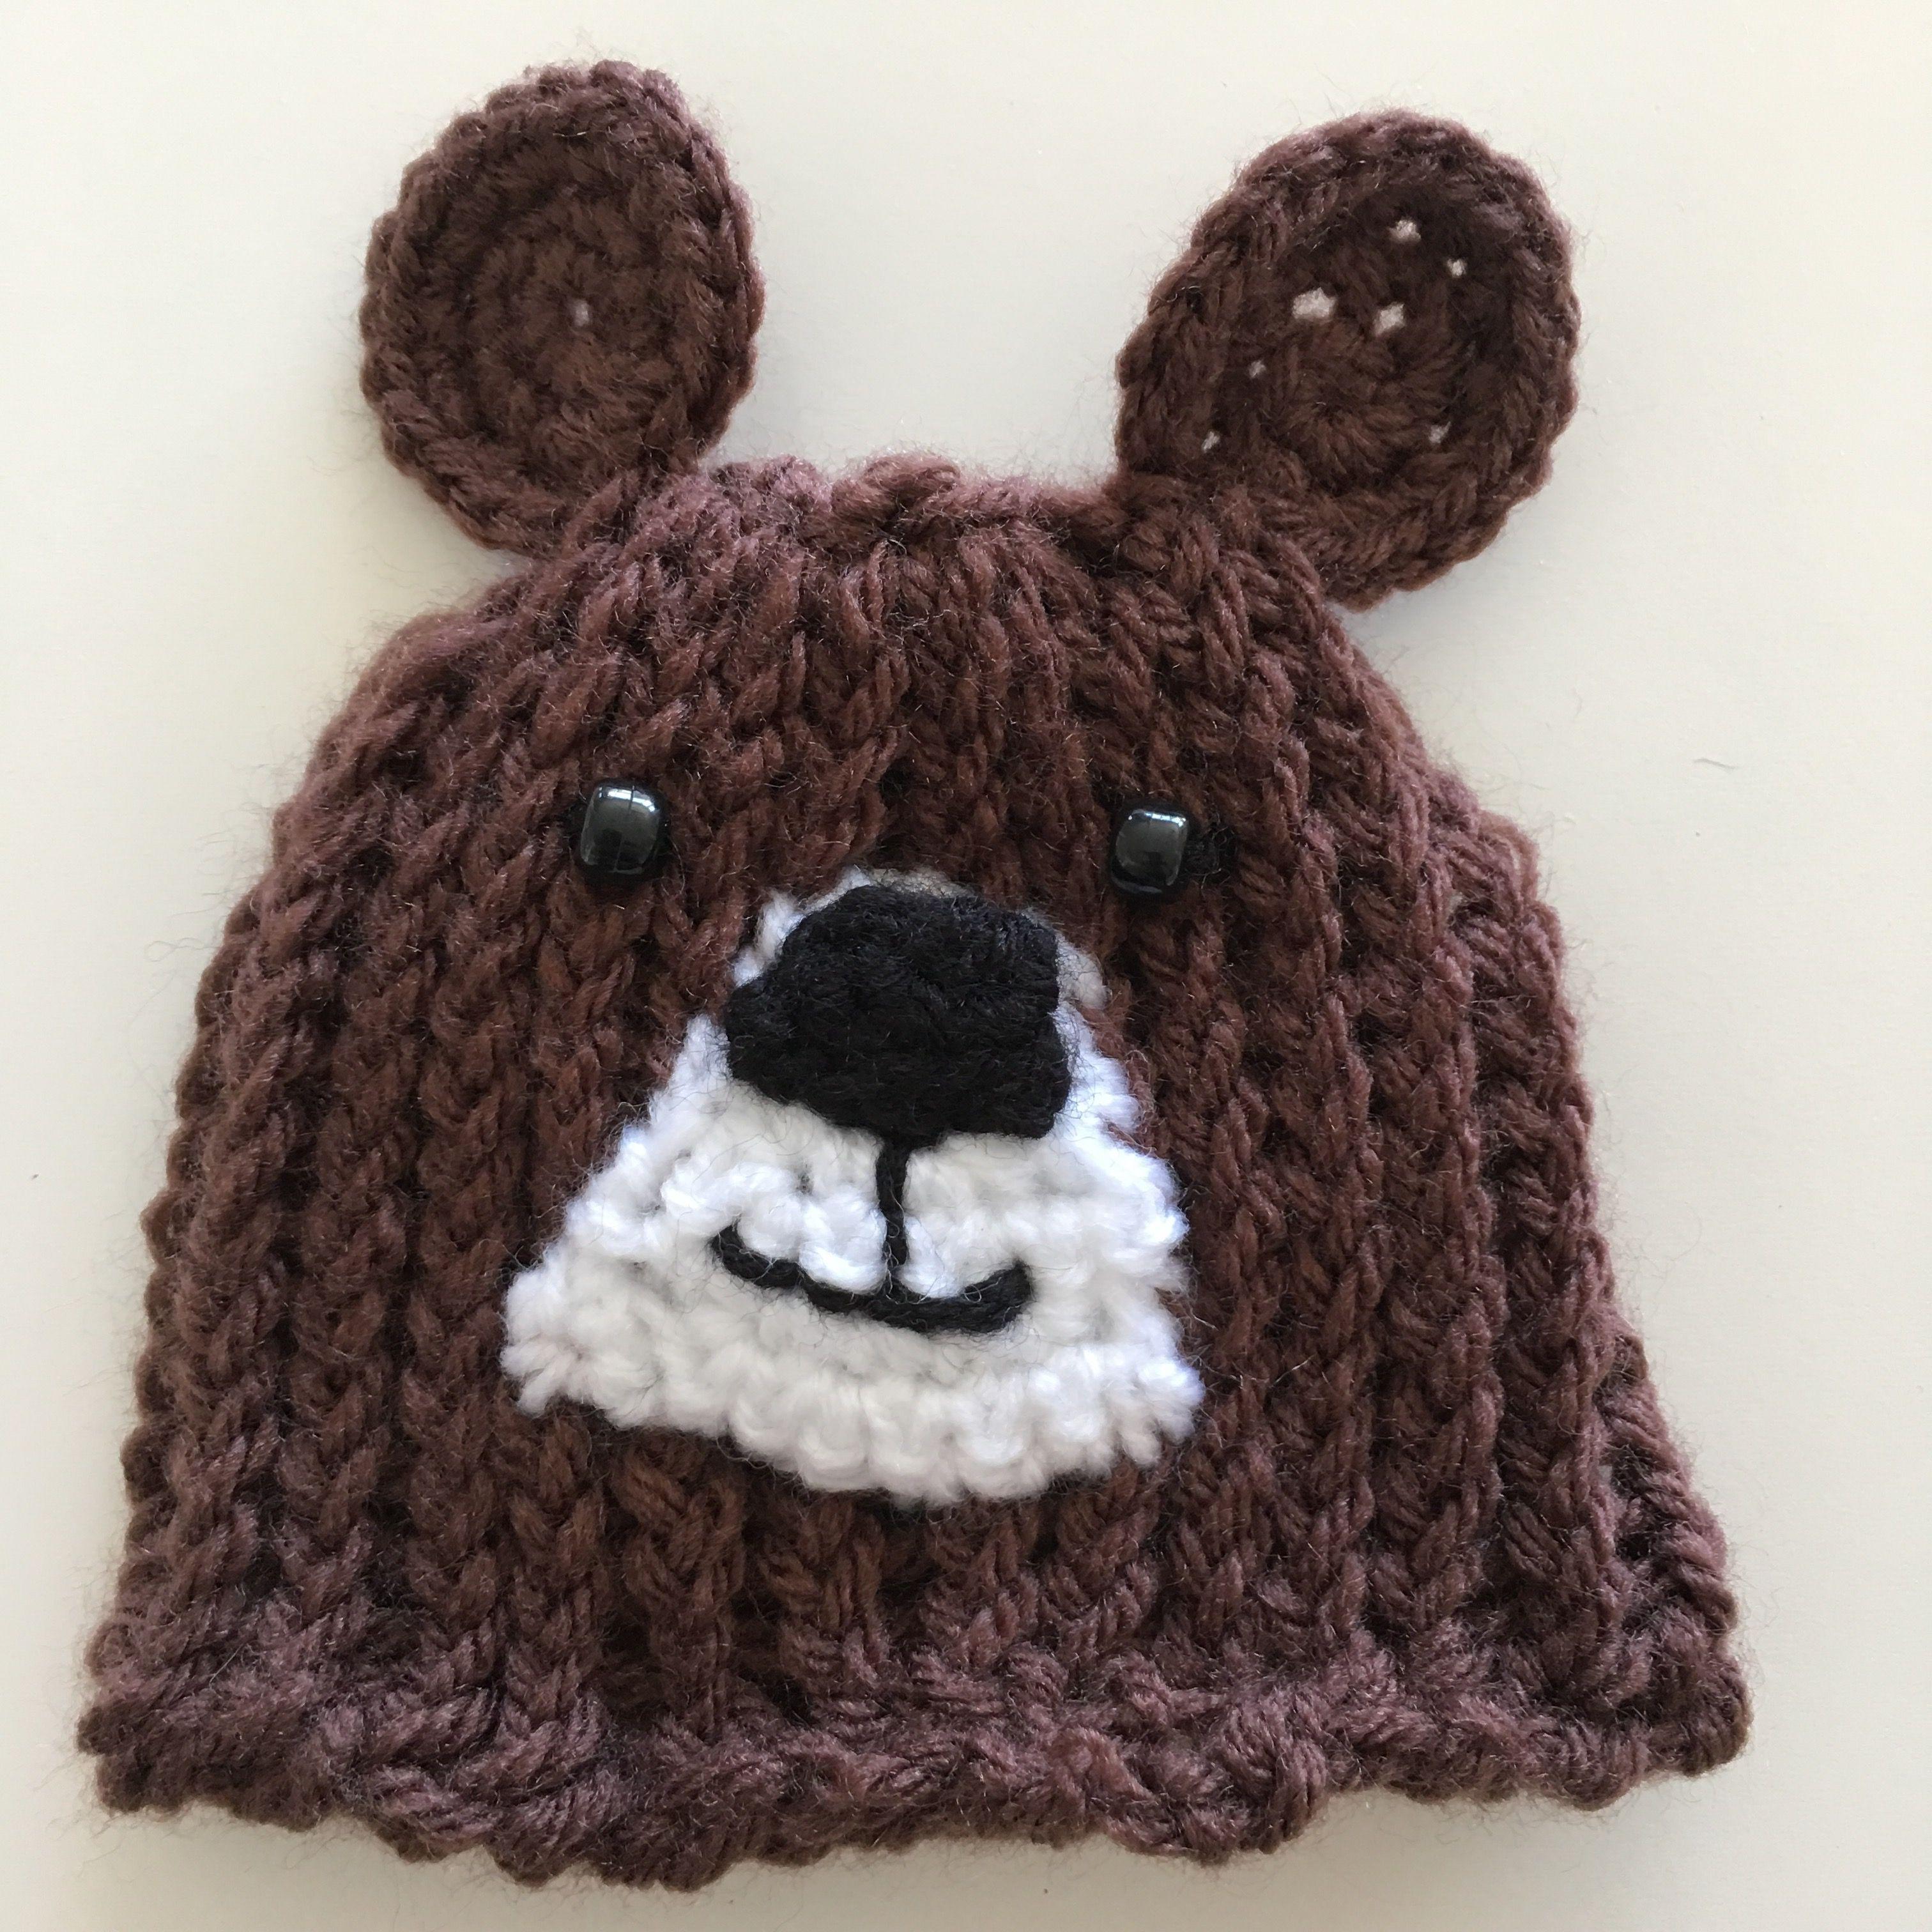 Newborn baby bear hat made on a loom crocheted ears and nose newborn baby bear hat made on a loom crocheted ears and nose bankloansurffo Gallery